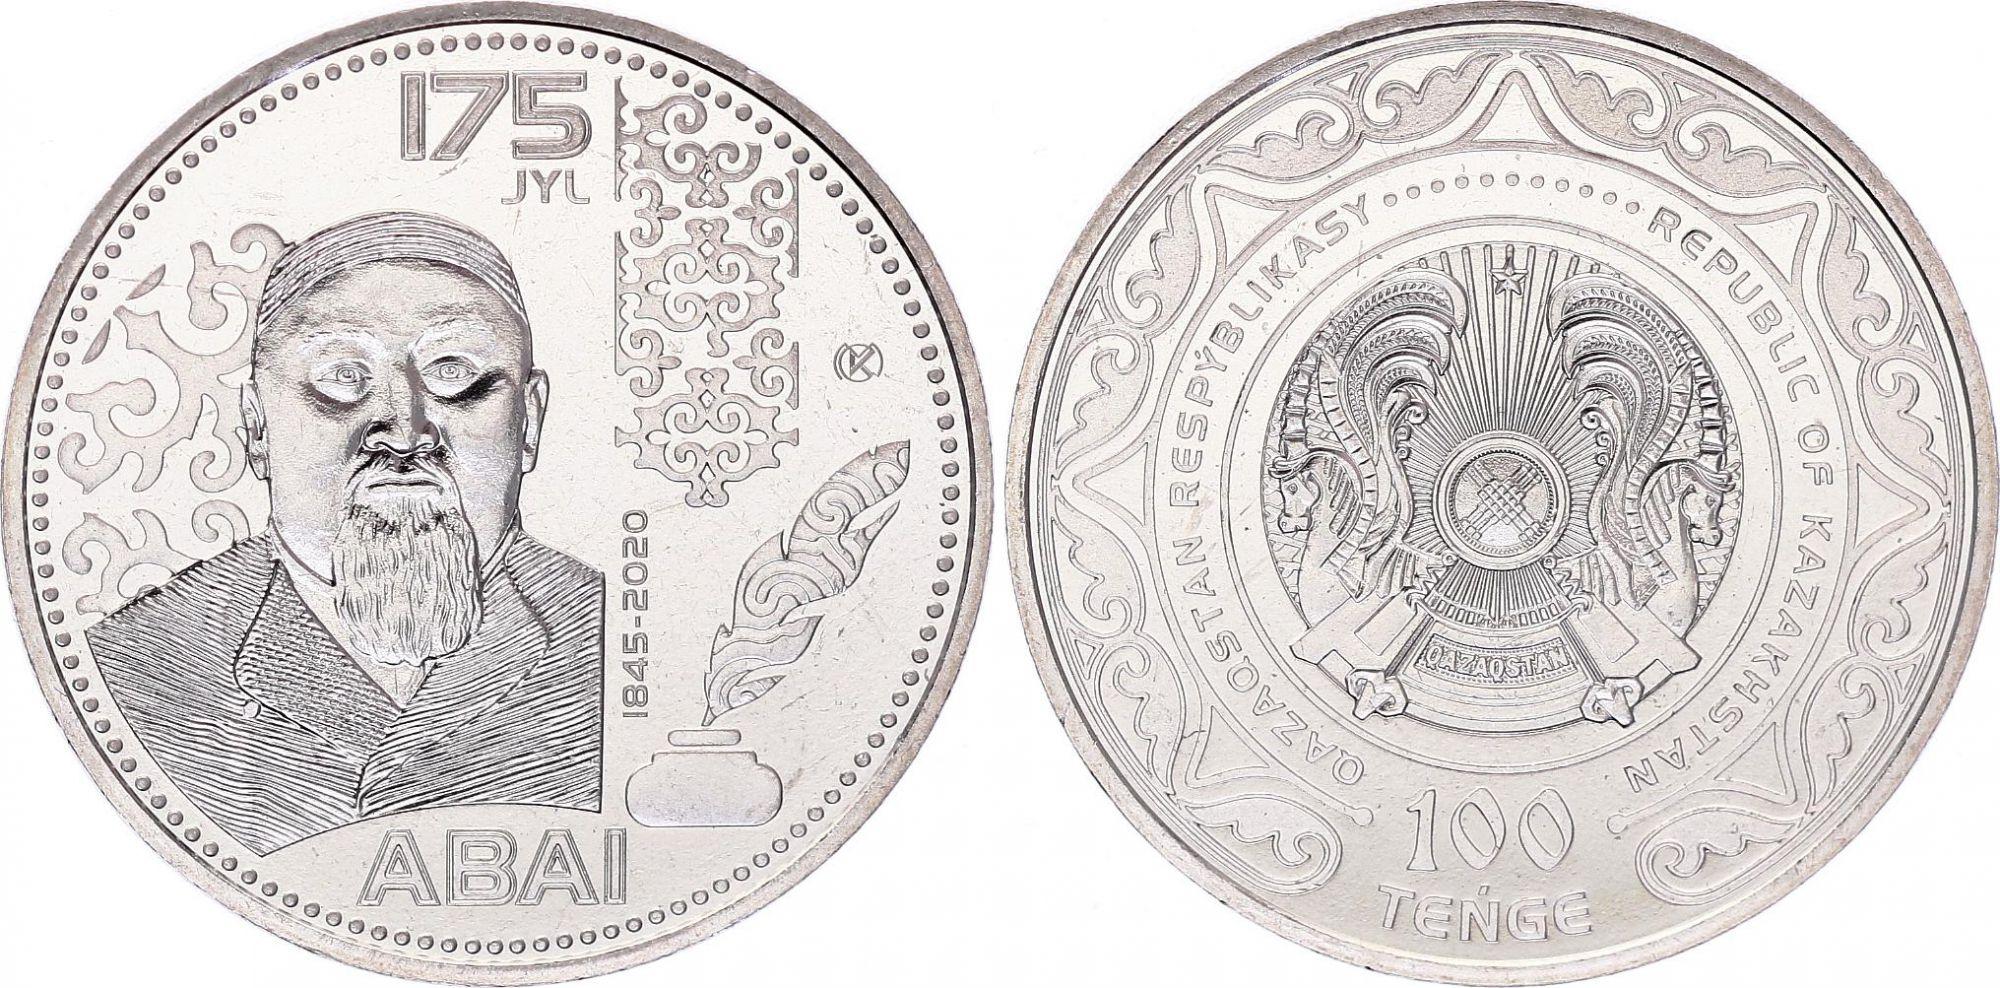 Kazakhstan 100 Tenge Abai Kunanbayev - 2020 - AU